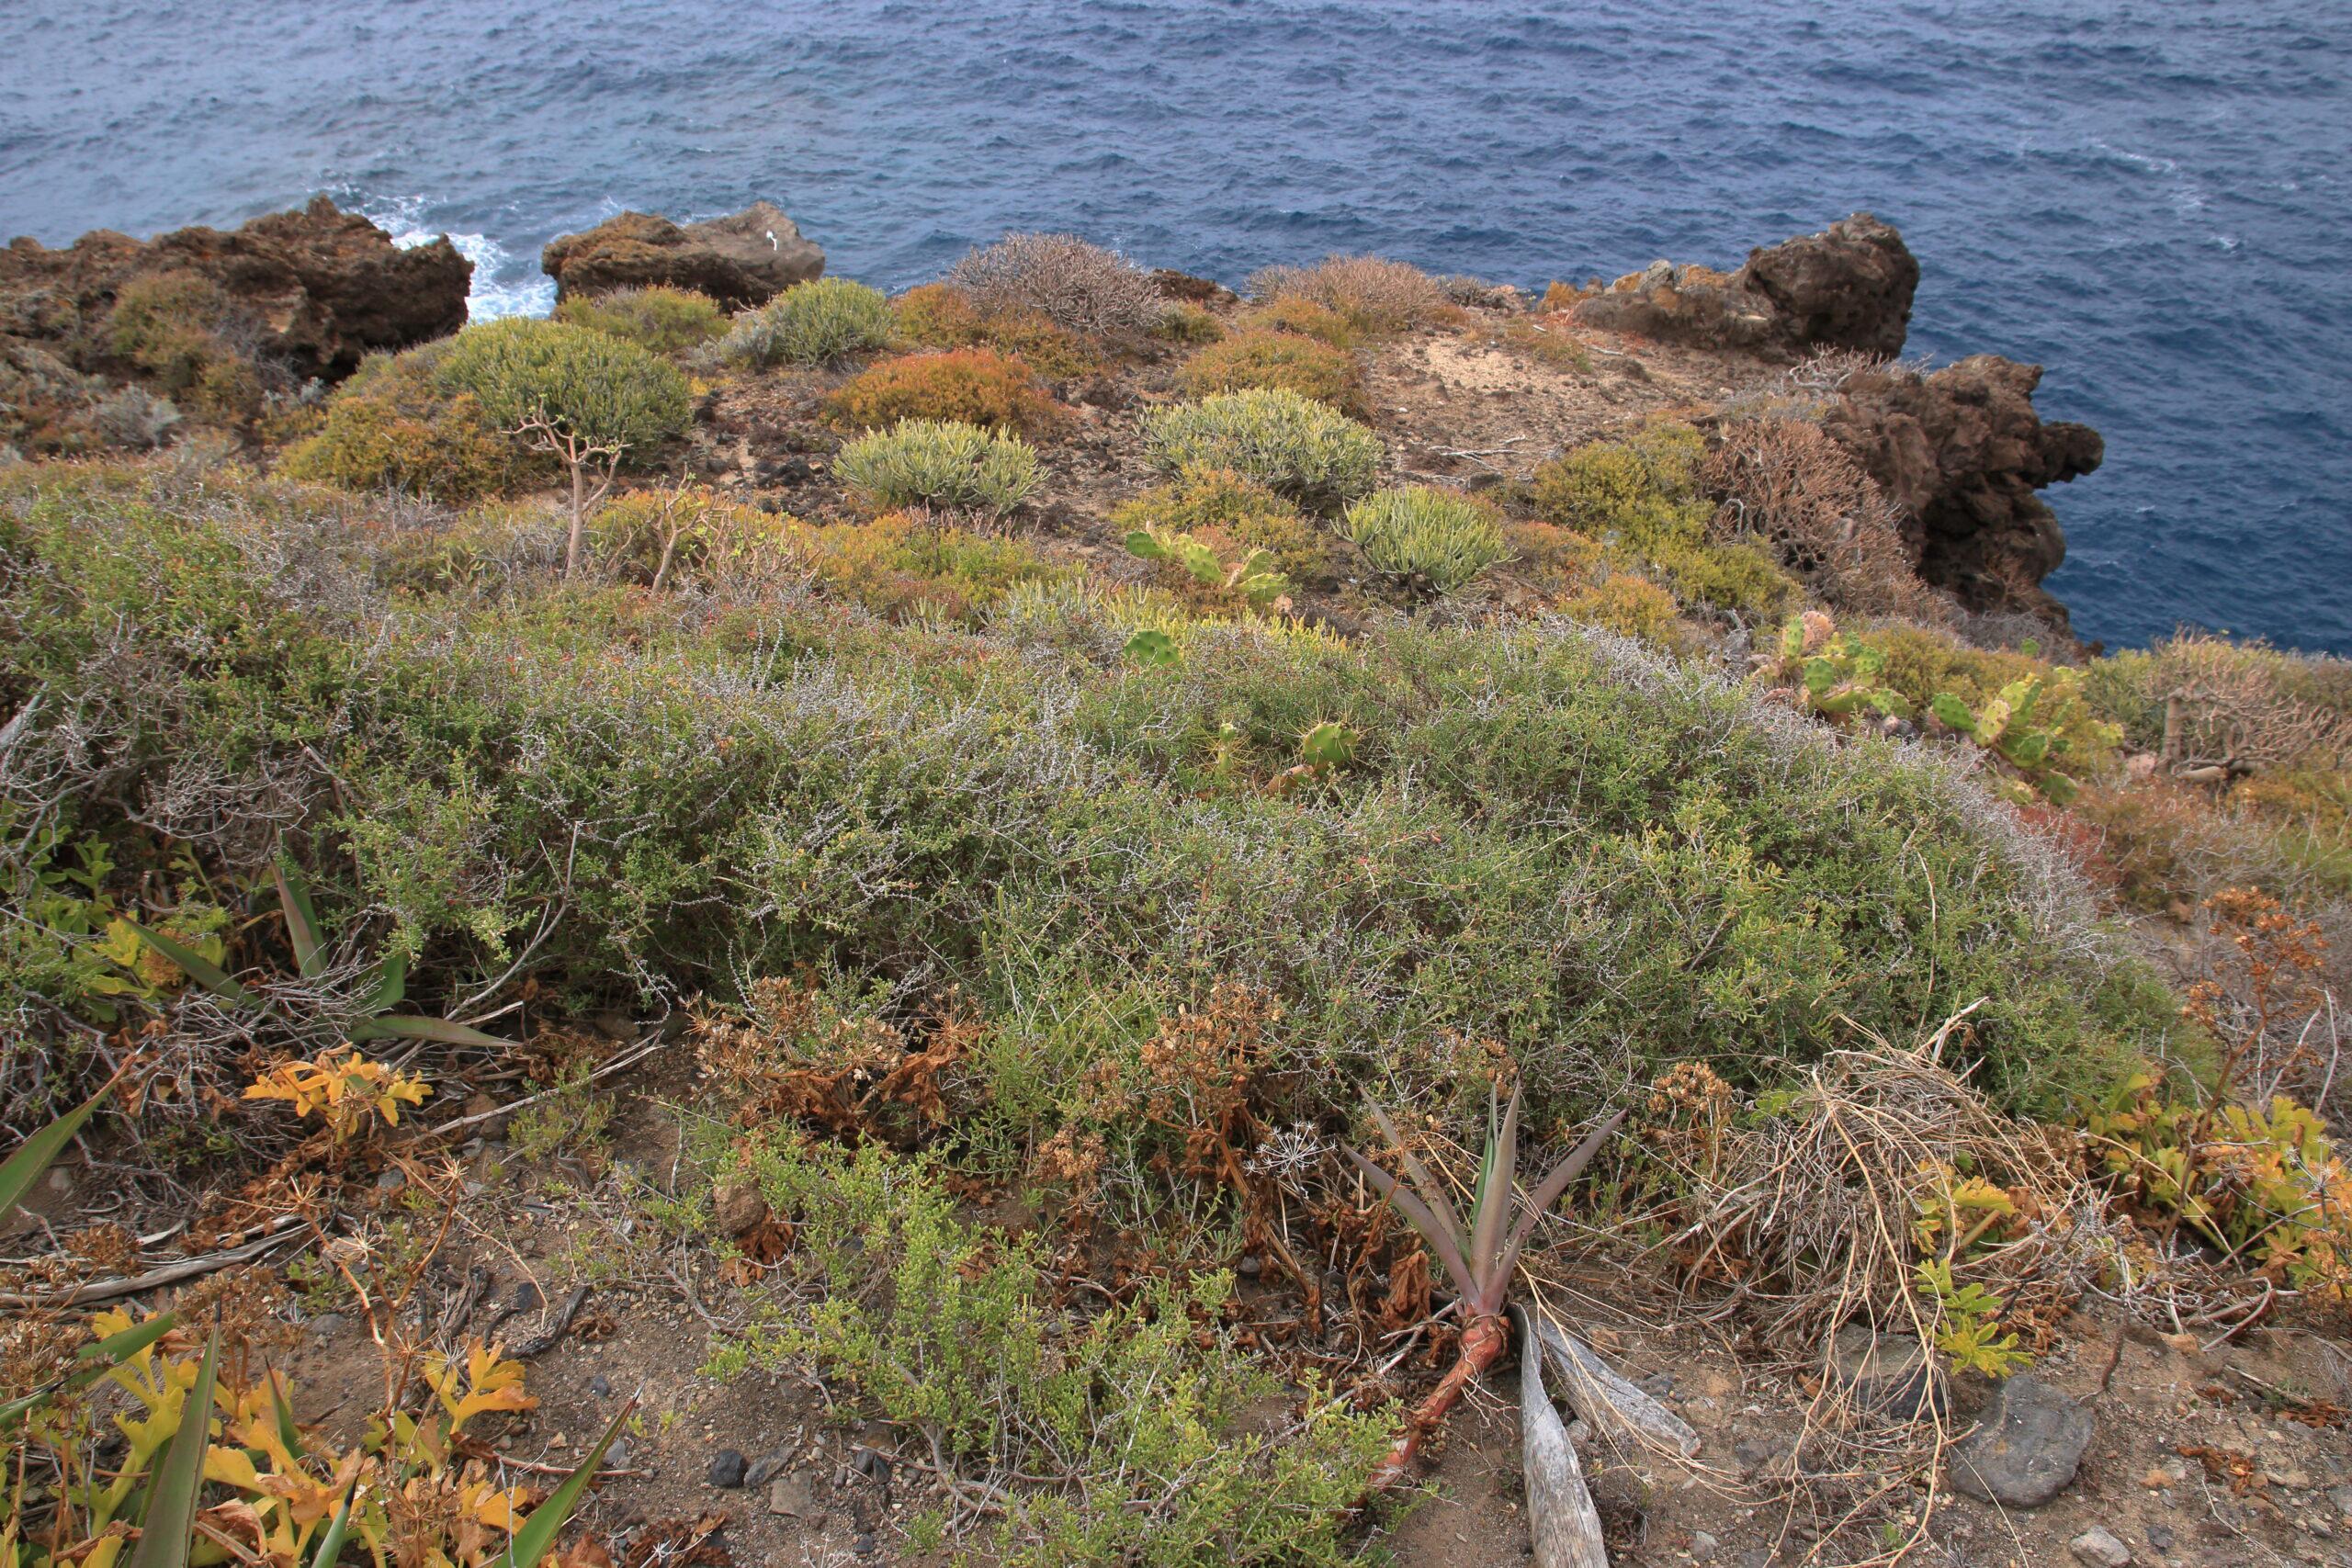 img_8579-habitat-toldas-salsolas-lechugas-de-mar-vegetacion-halofila-scaled.jpg